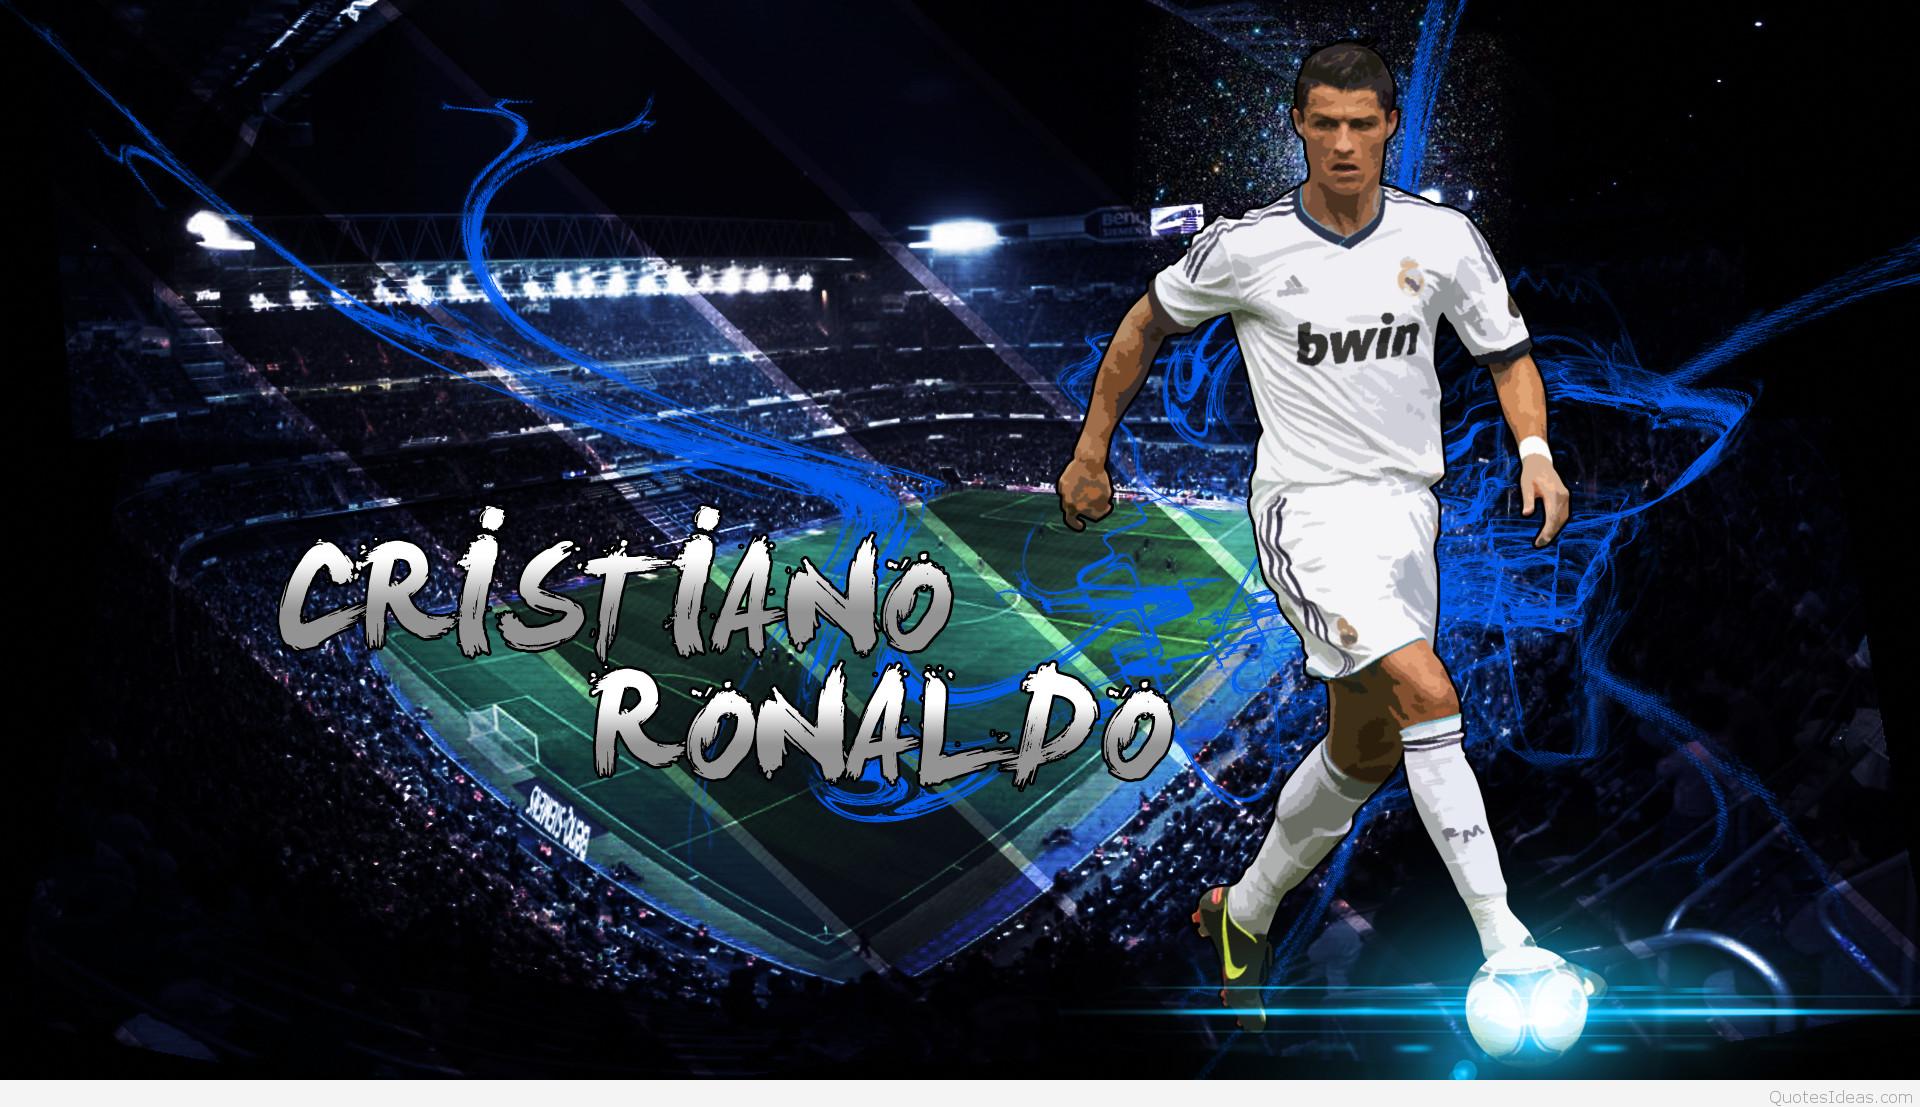 Zendha Cool Soccer Wallpapers Ronaldo